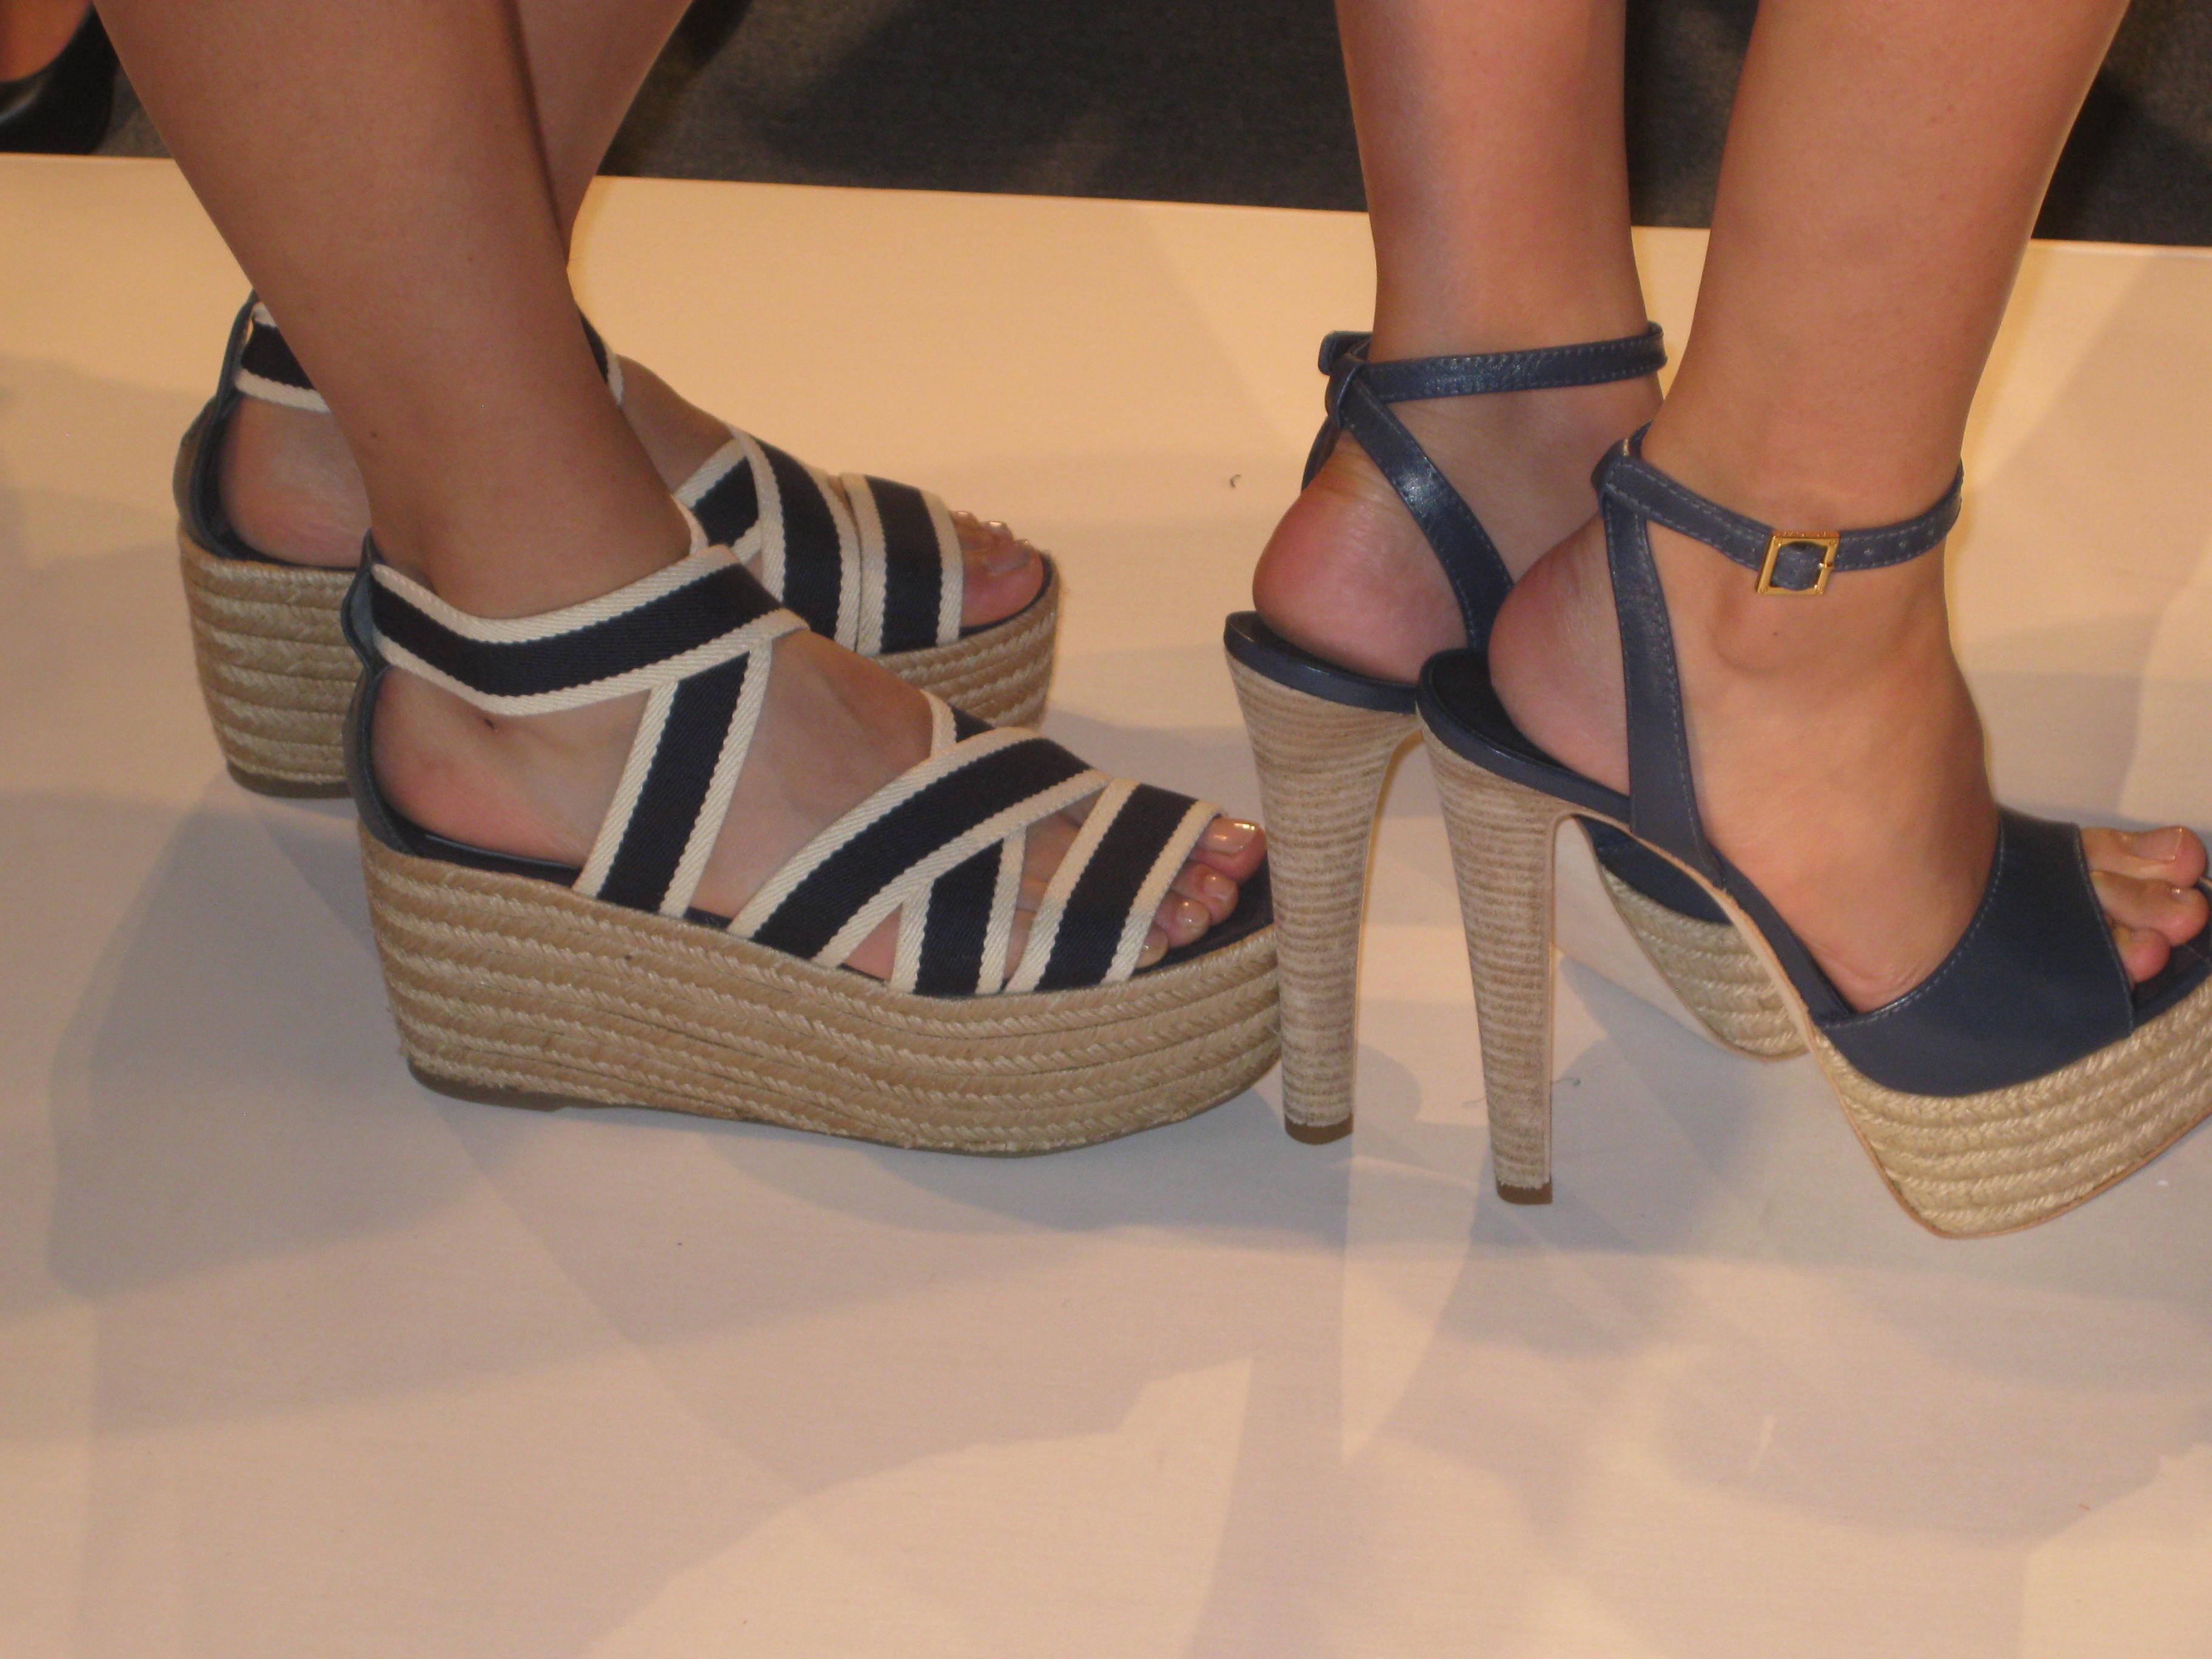 c6dd1592720a ... The Shoe Expert. Flatforms vs Platforms